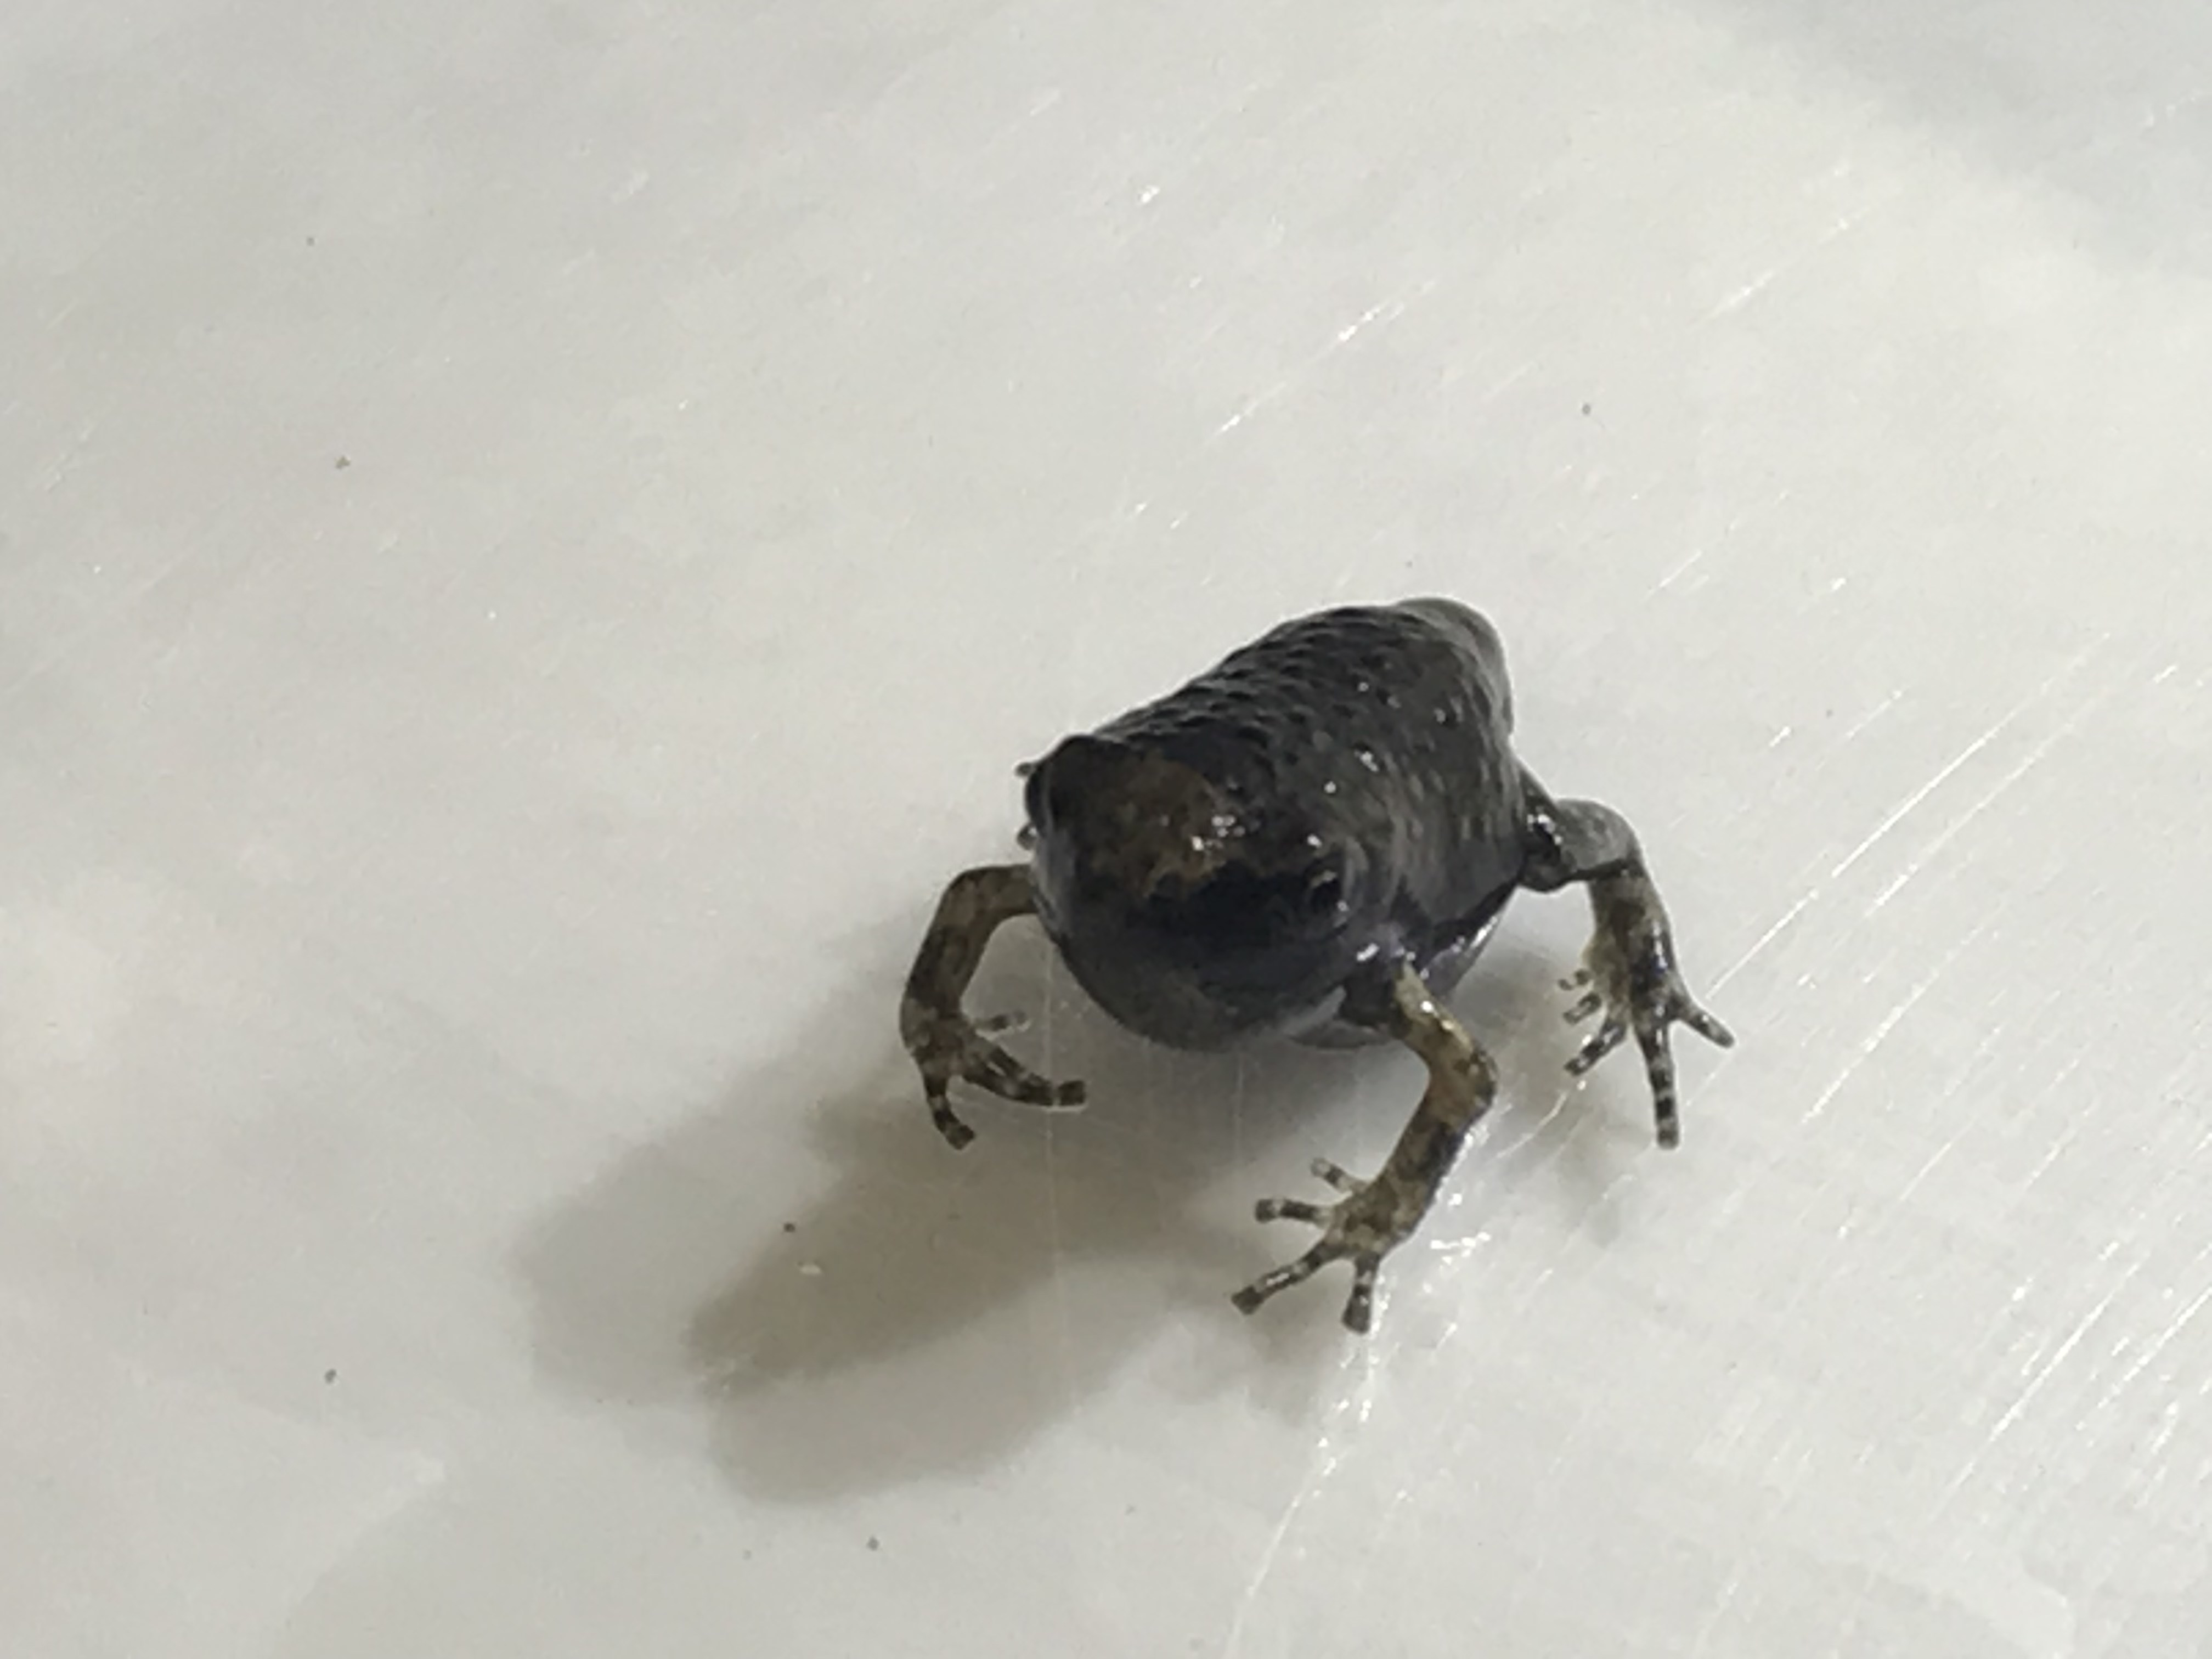 Asian bullfrog froglet